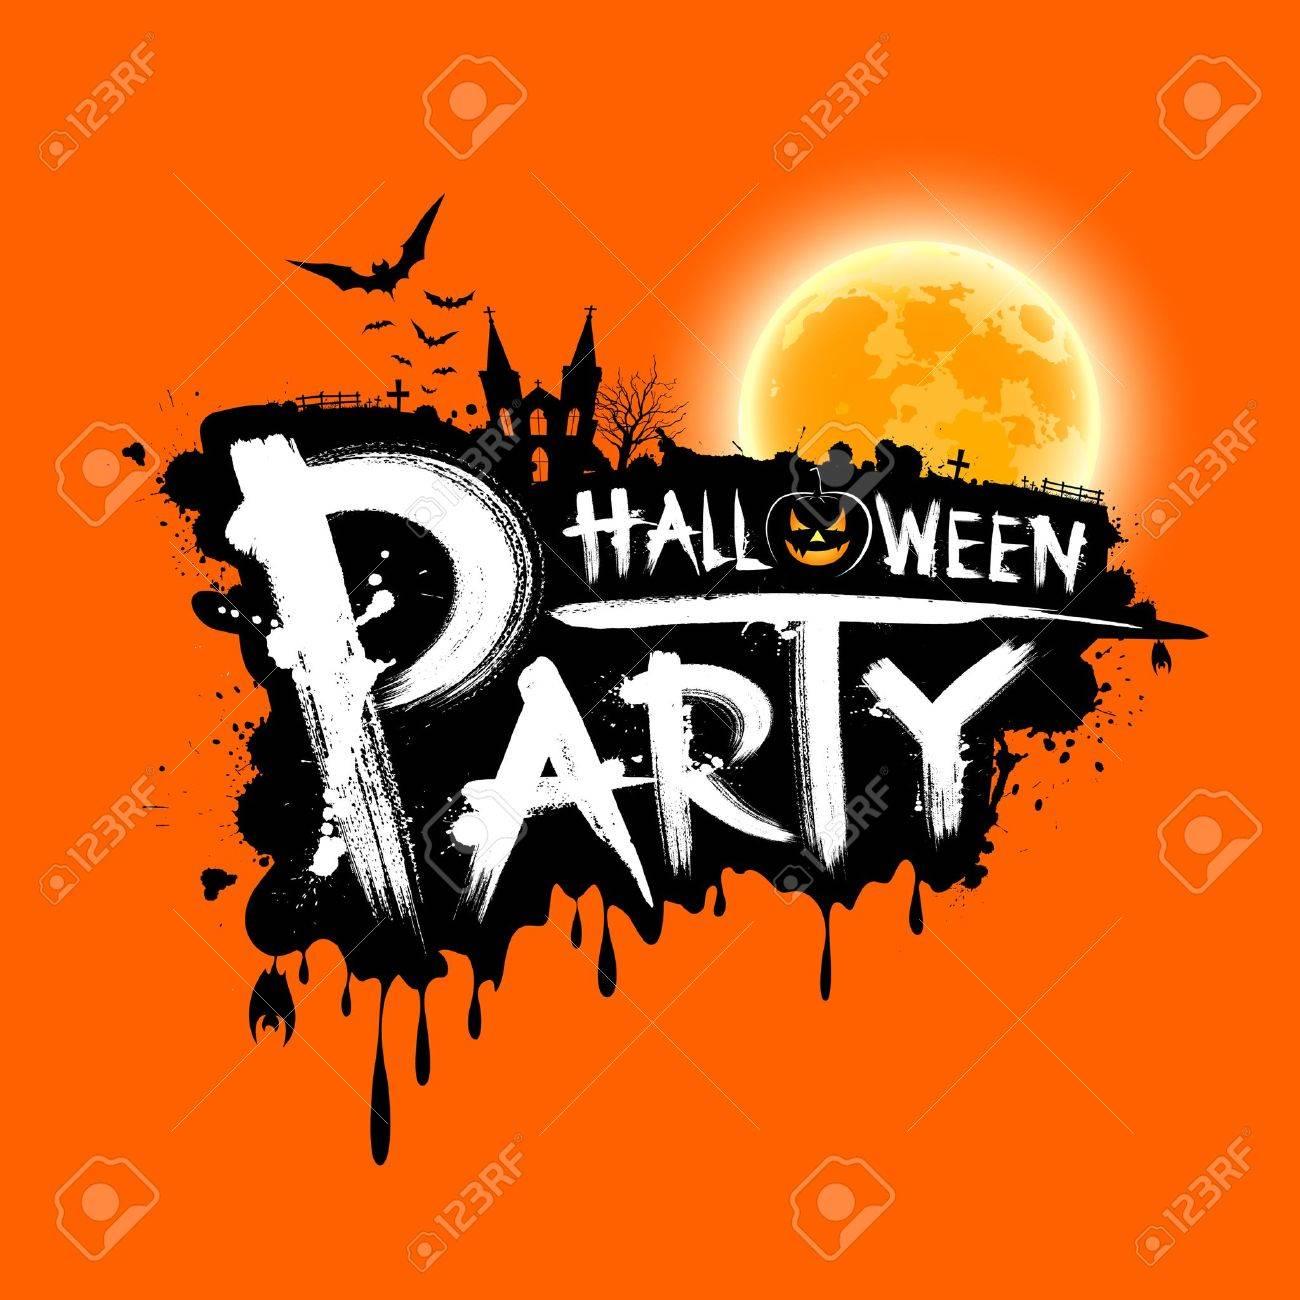 Happy Halloween Party Text Design On Orange Background Royalty ...